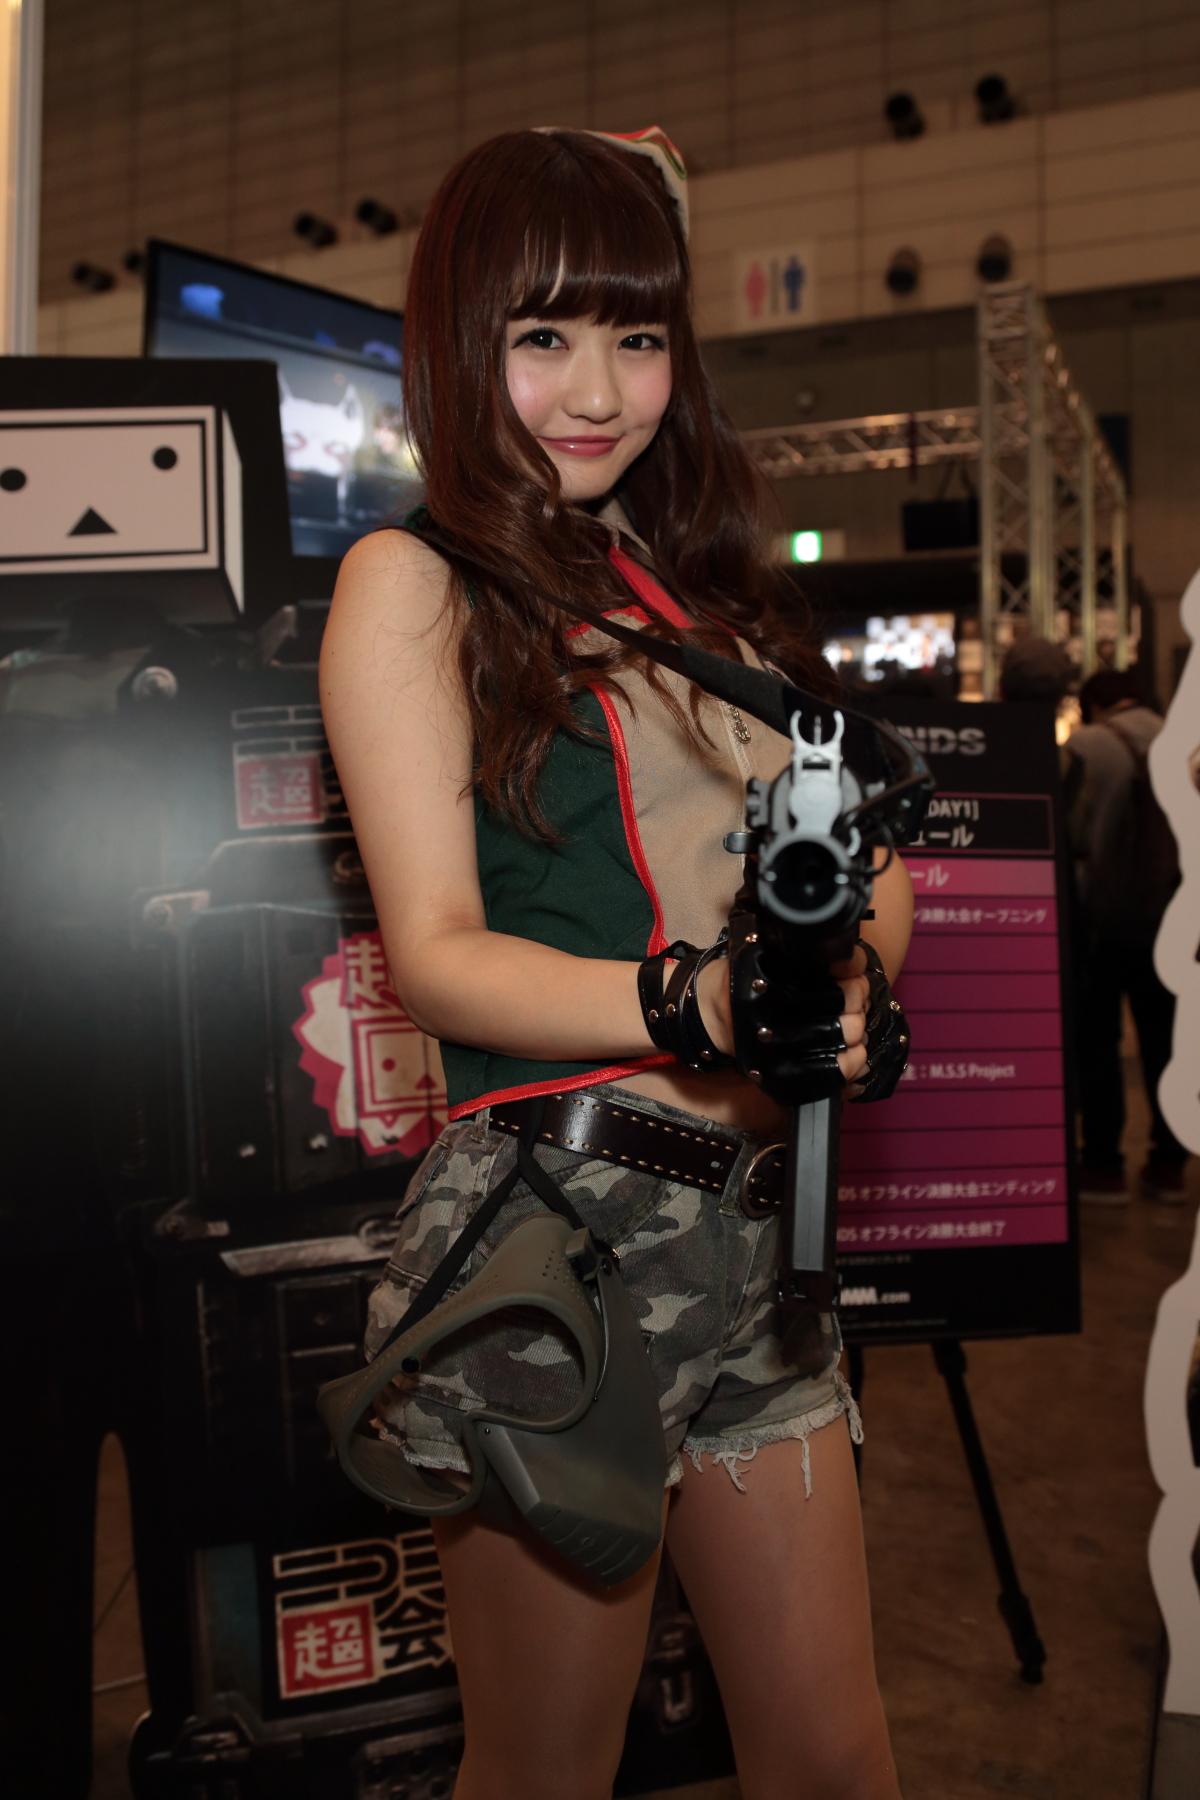 中村奏絵 dmm ニコ超 (3)